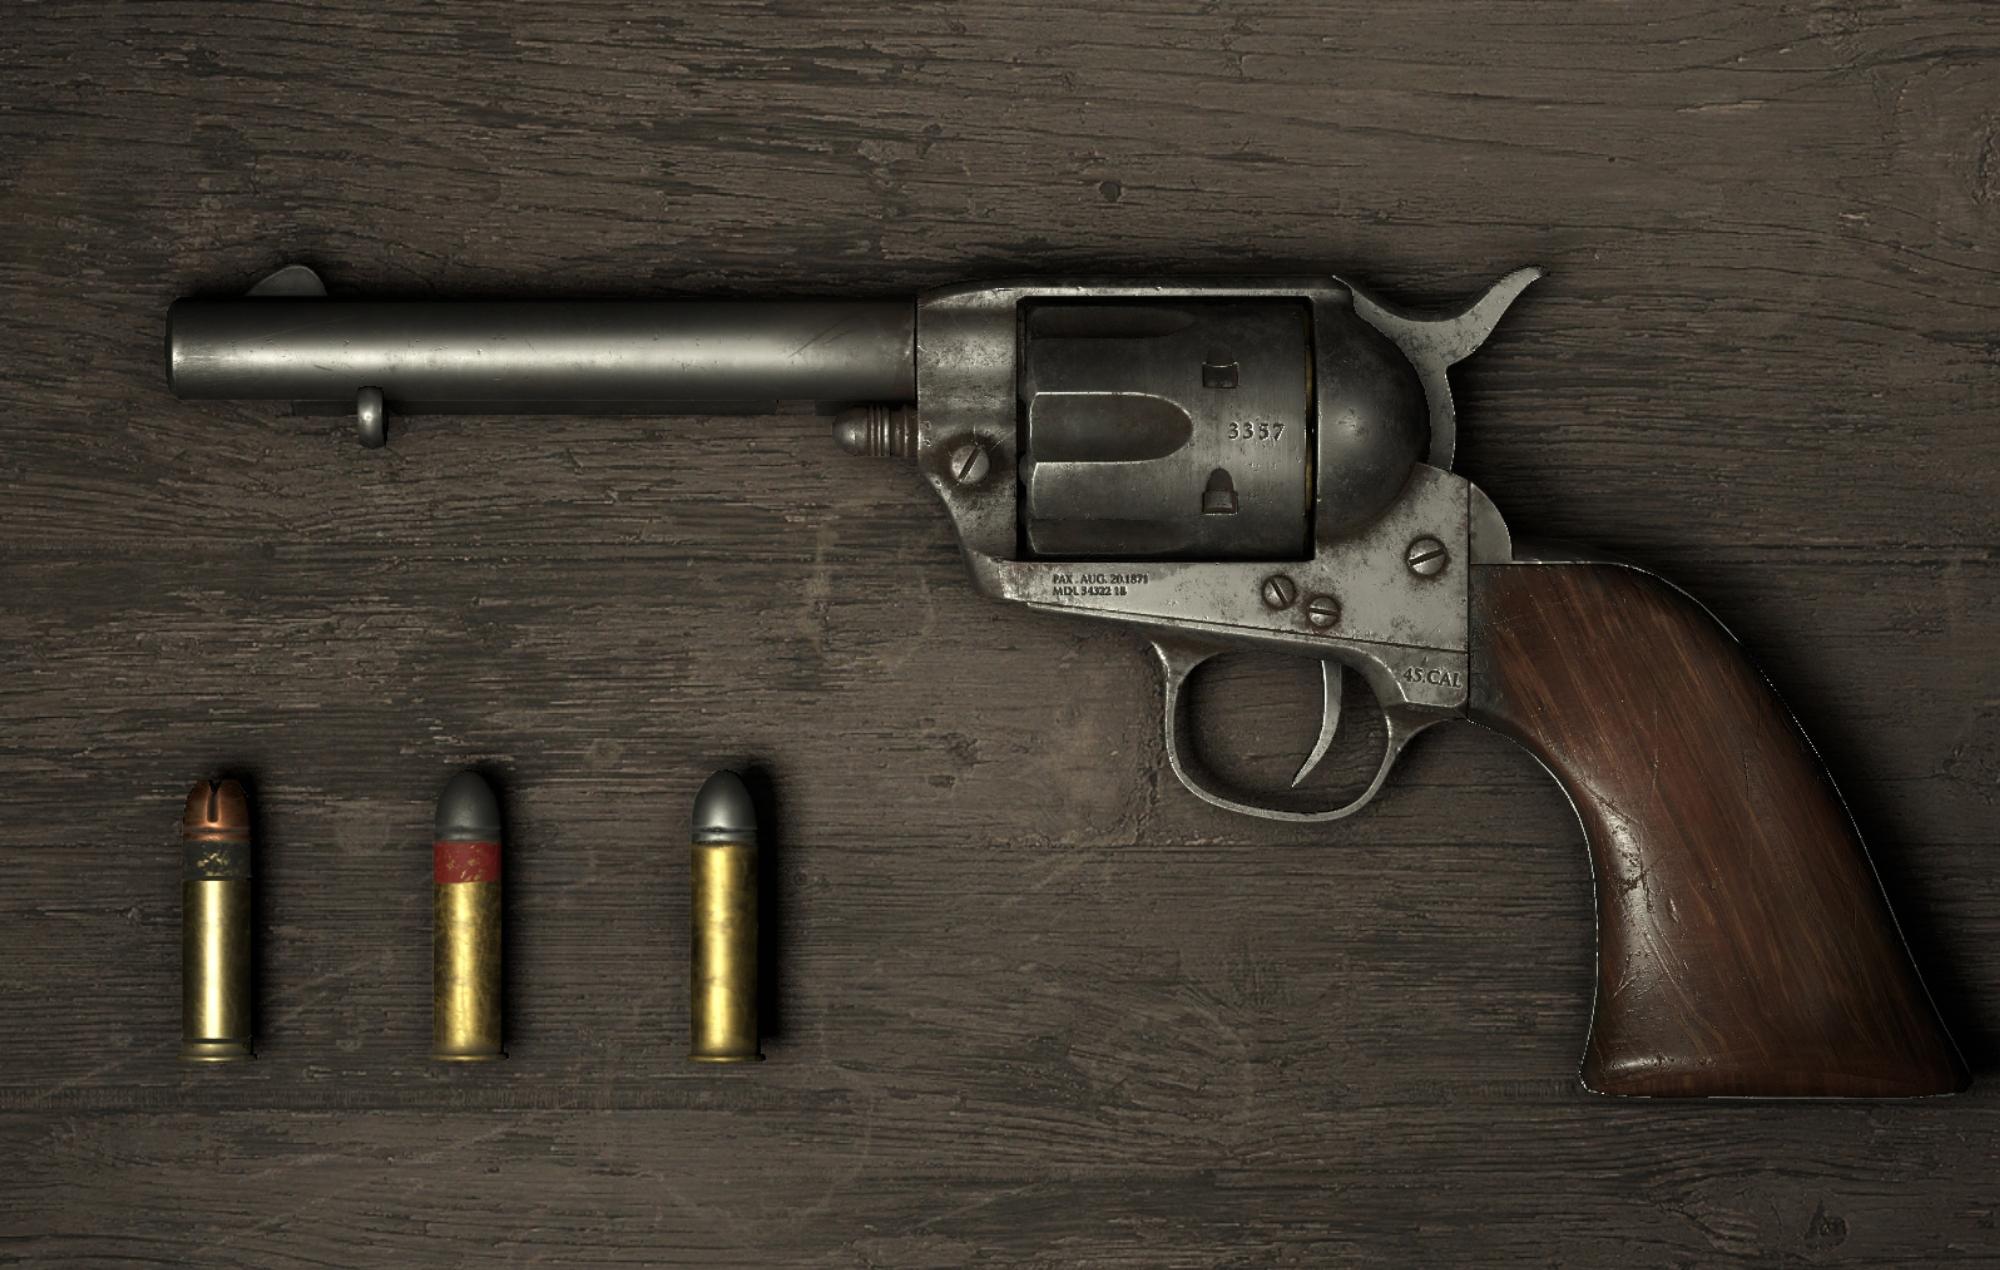 Hunt: Showdown Revolver & Ammo